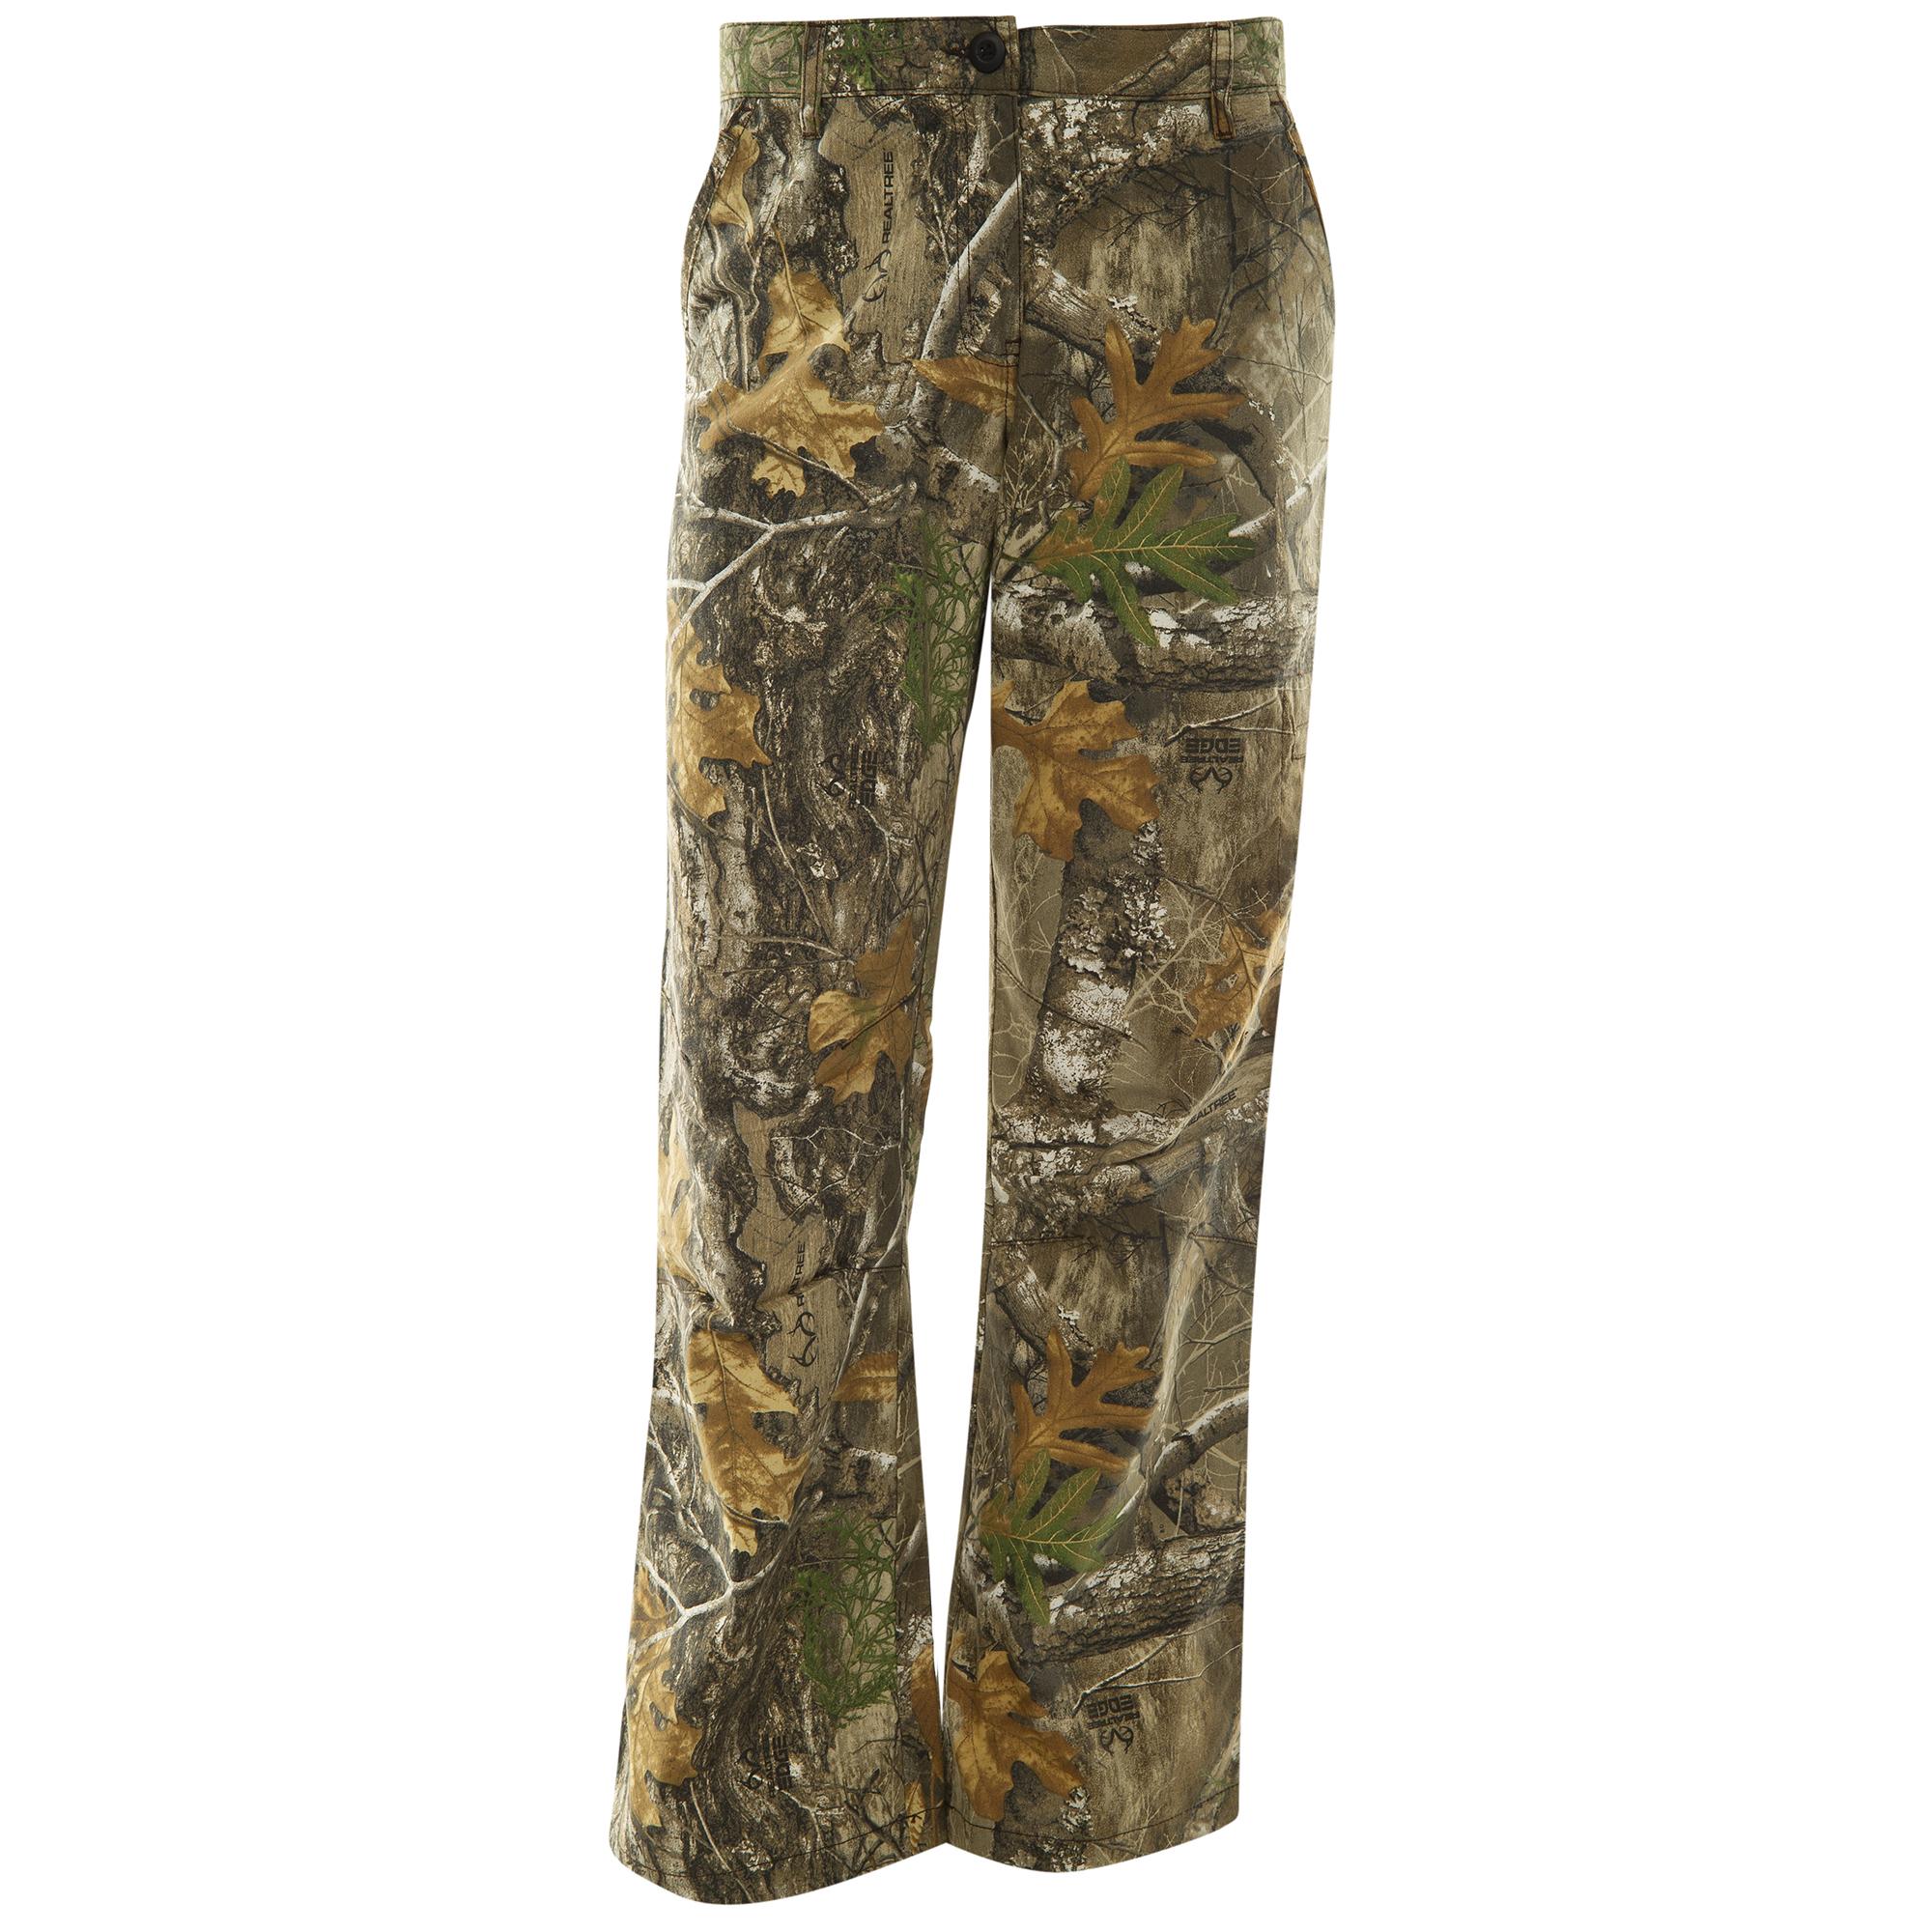 Hunter's Choice Women's Camo Hunting Pant, Realtree Edge